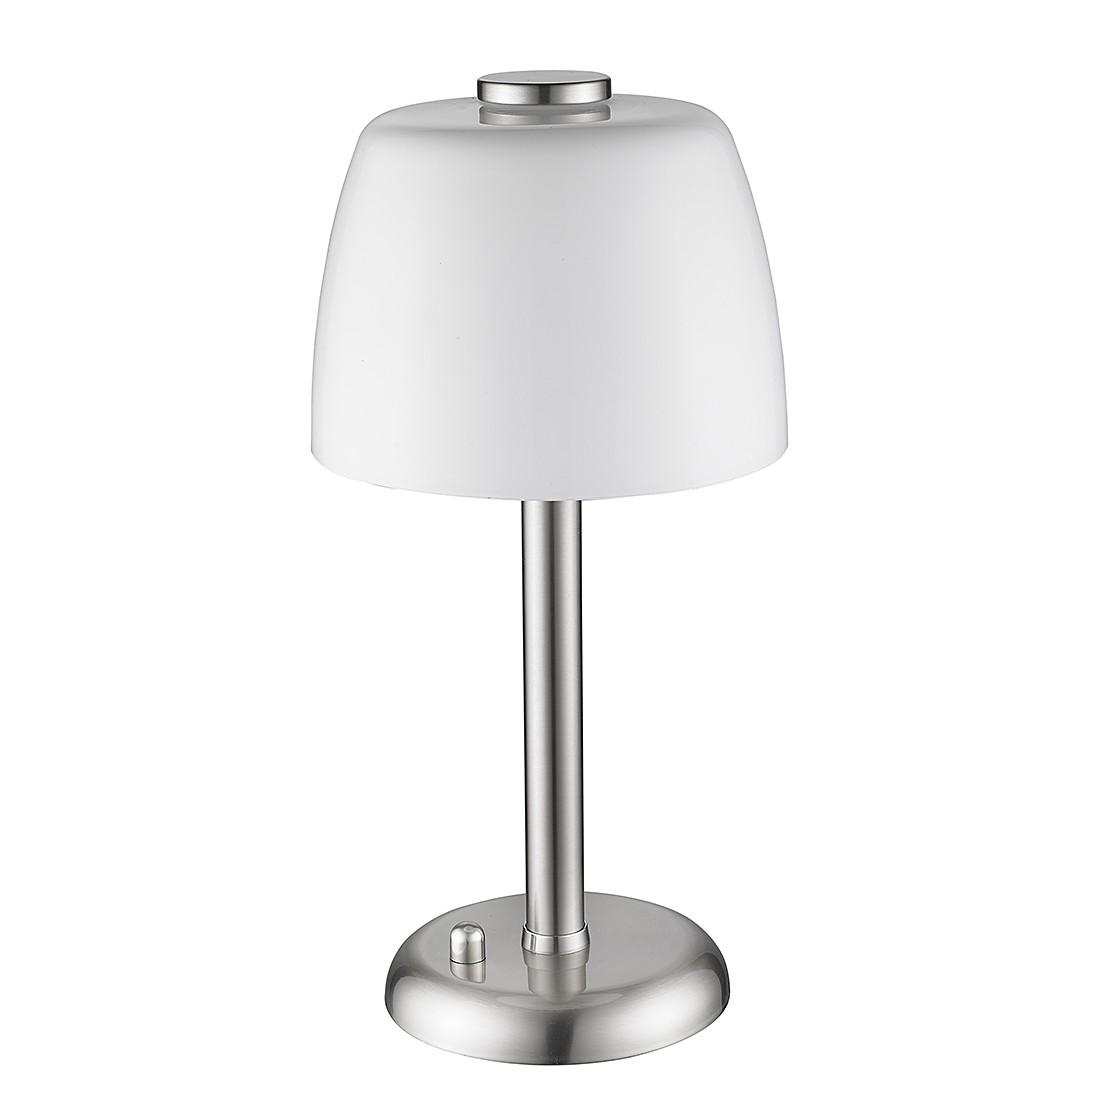 LED Tischleuchte Casco ● Metall ● 1-flammig- Sorpetaler A+